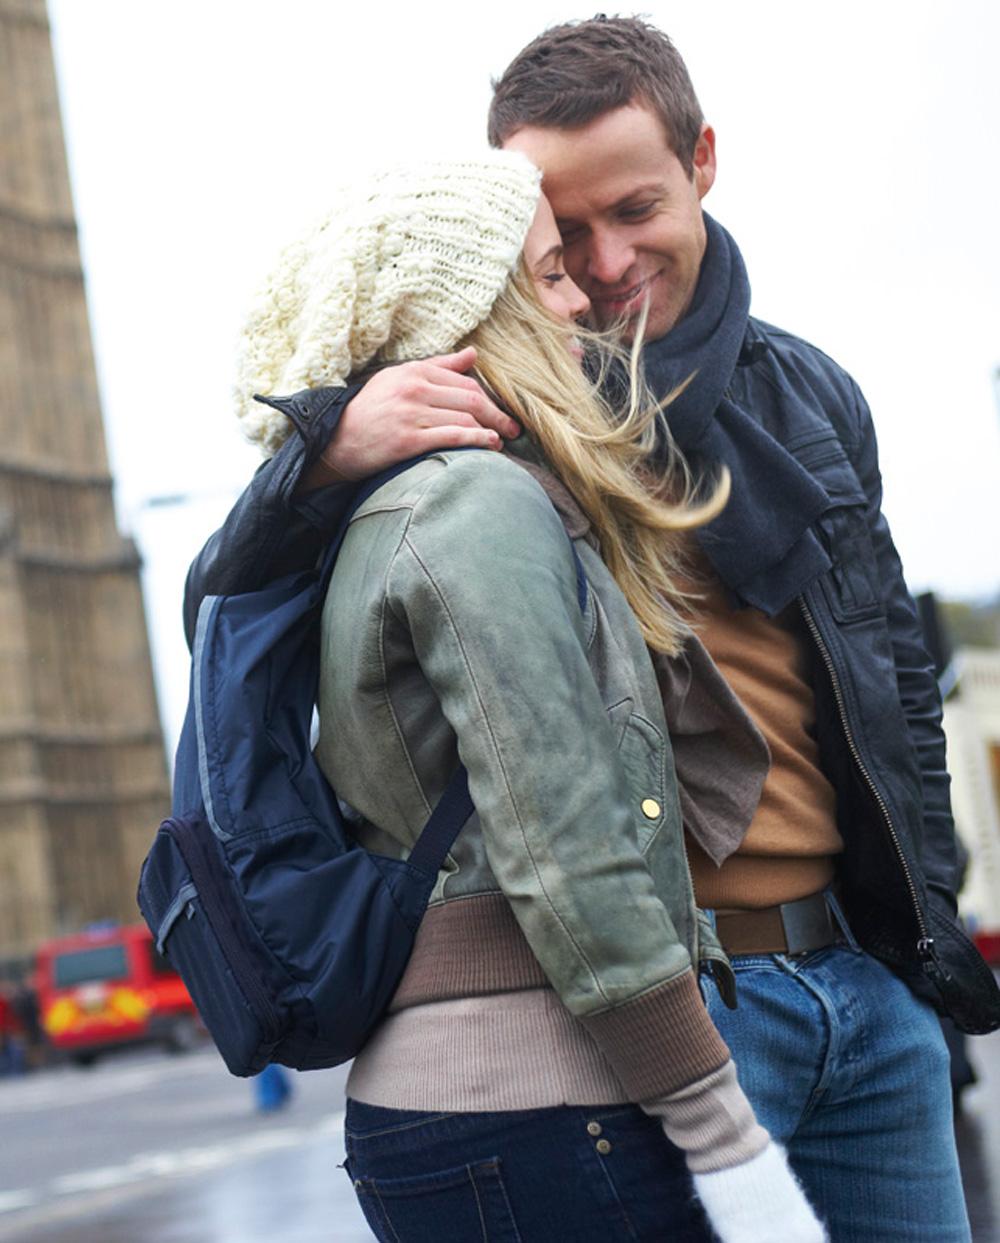 couple_traveling_backpack.jpg